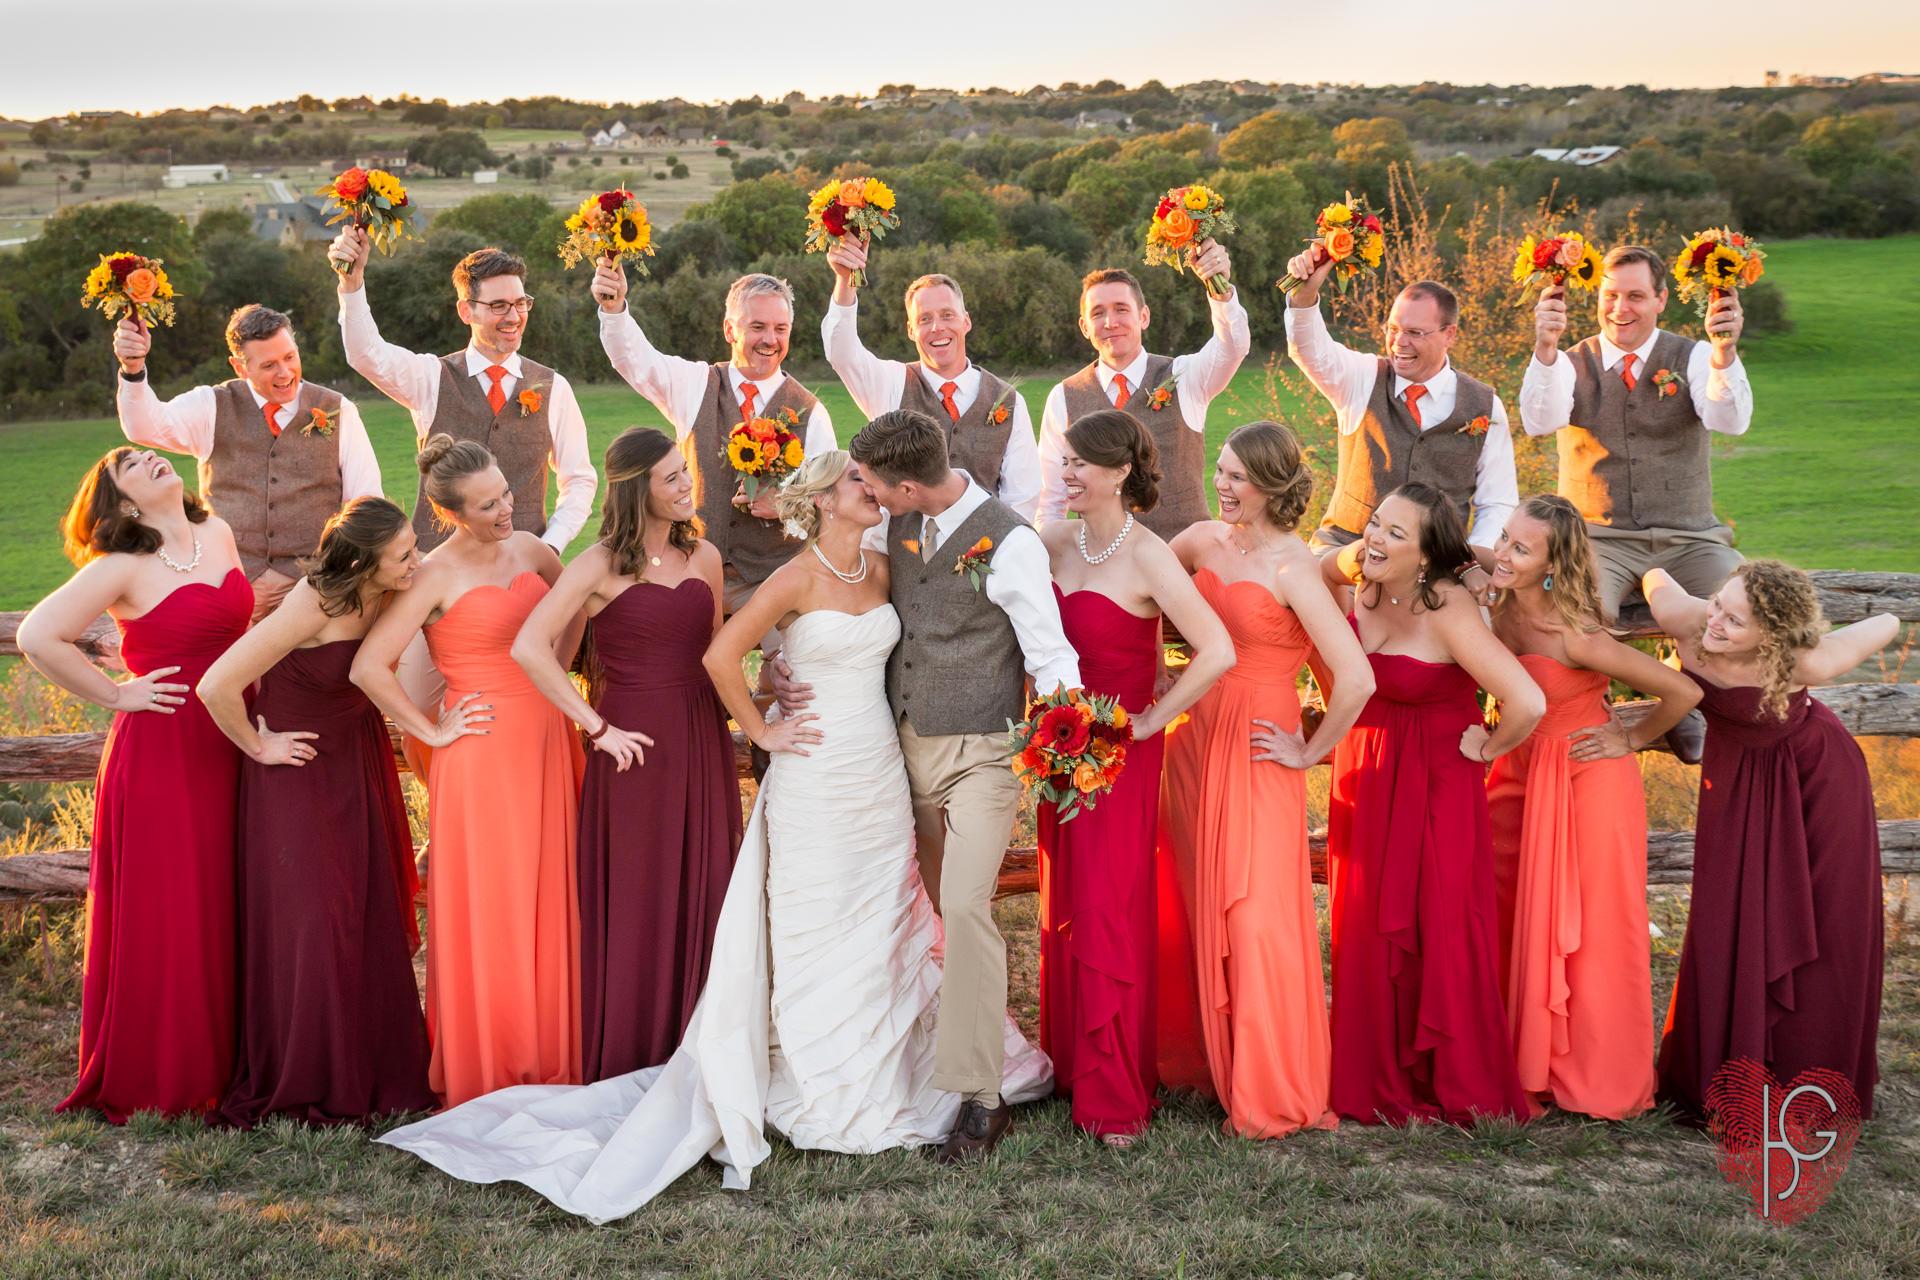 weatherford-wedding-photography-21.jpg